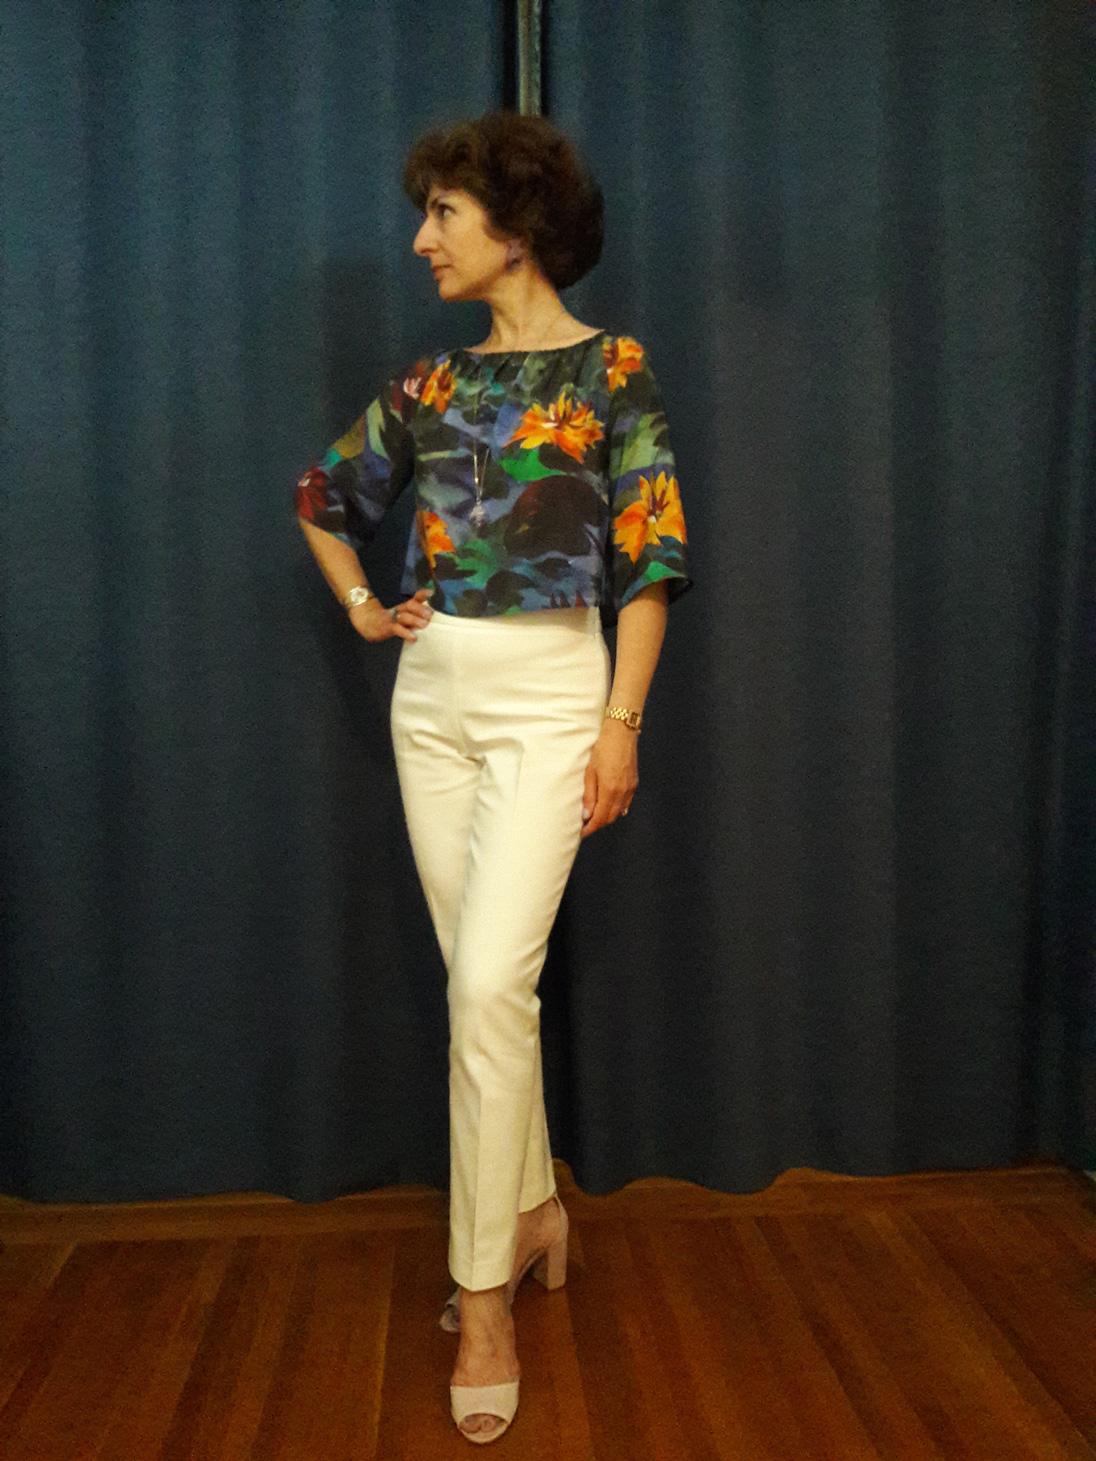 waterlillies-blouse.jpg